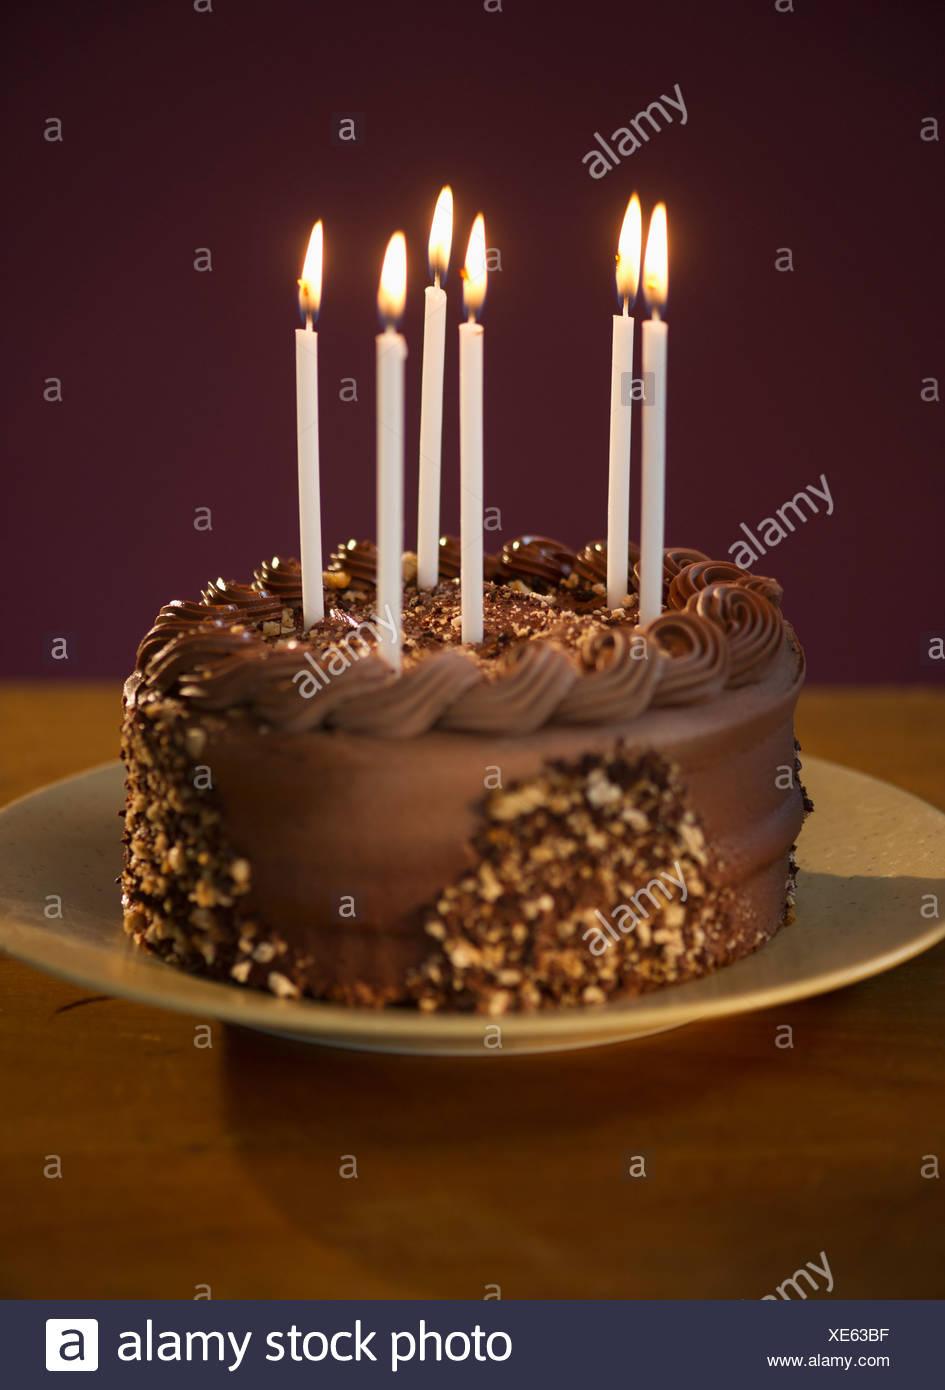 Stupendous Studio Shot Of Chocolate Birthday Cake Stock Photo 284105459 Alamy Birthday Cards Printable Trancafe Filternl